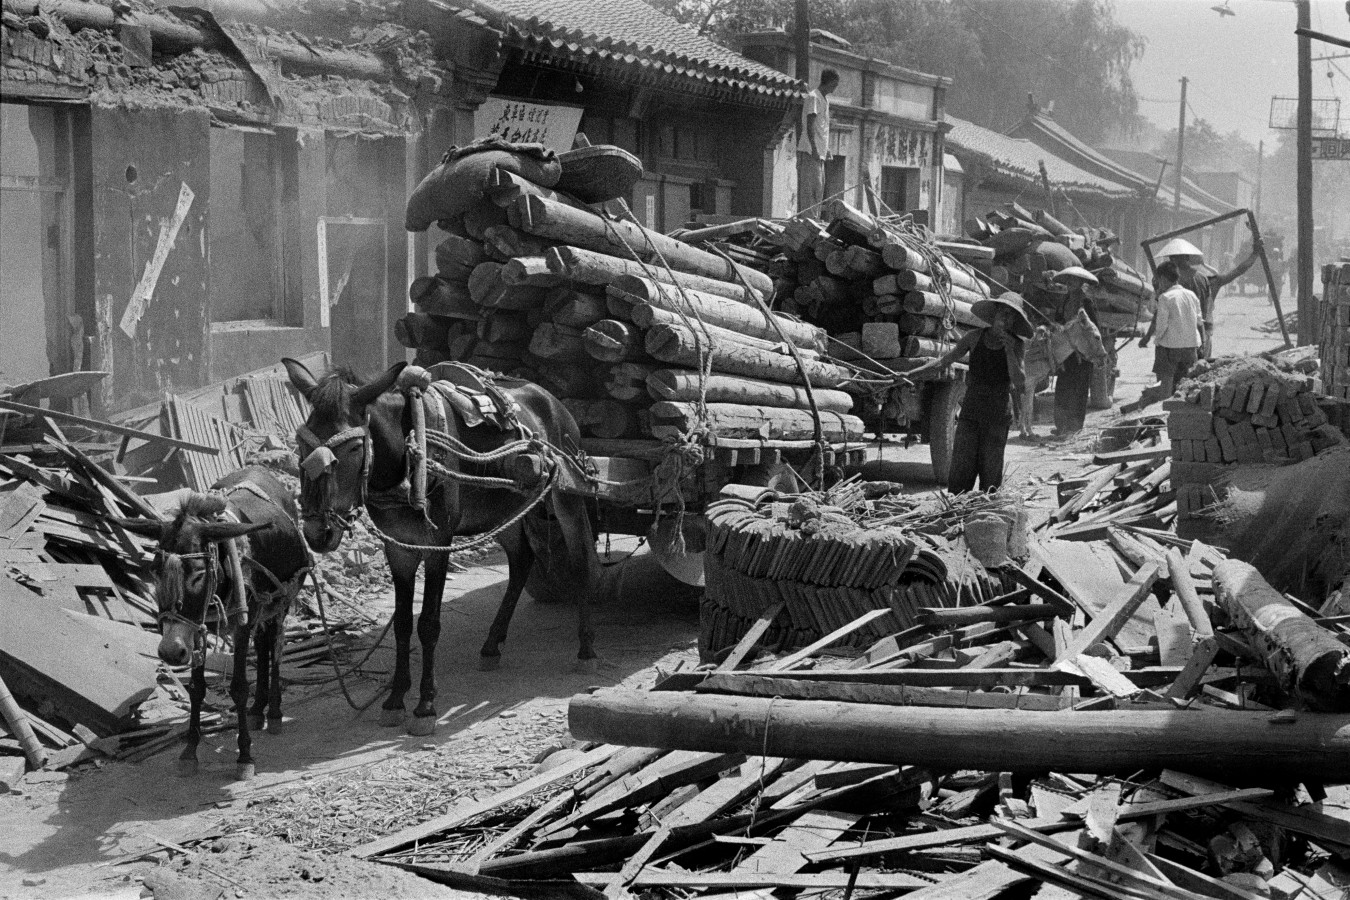 Galería: Henri Cartier-Bresson China 1958 | Oscar en Fotos